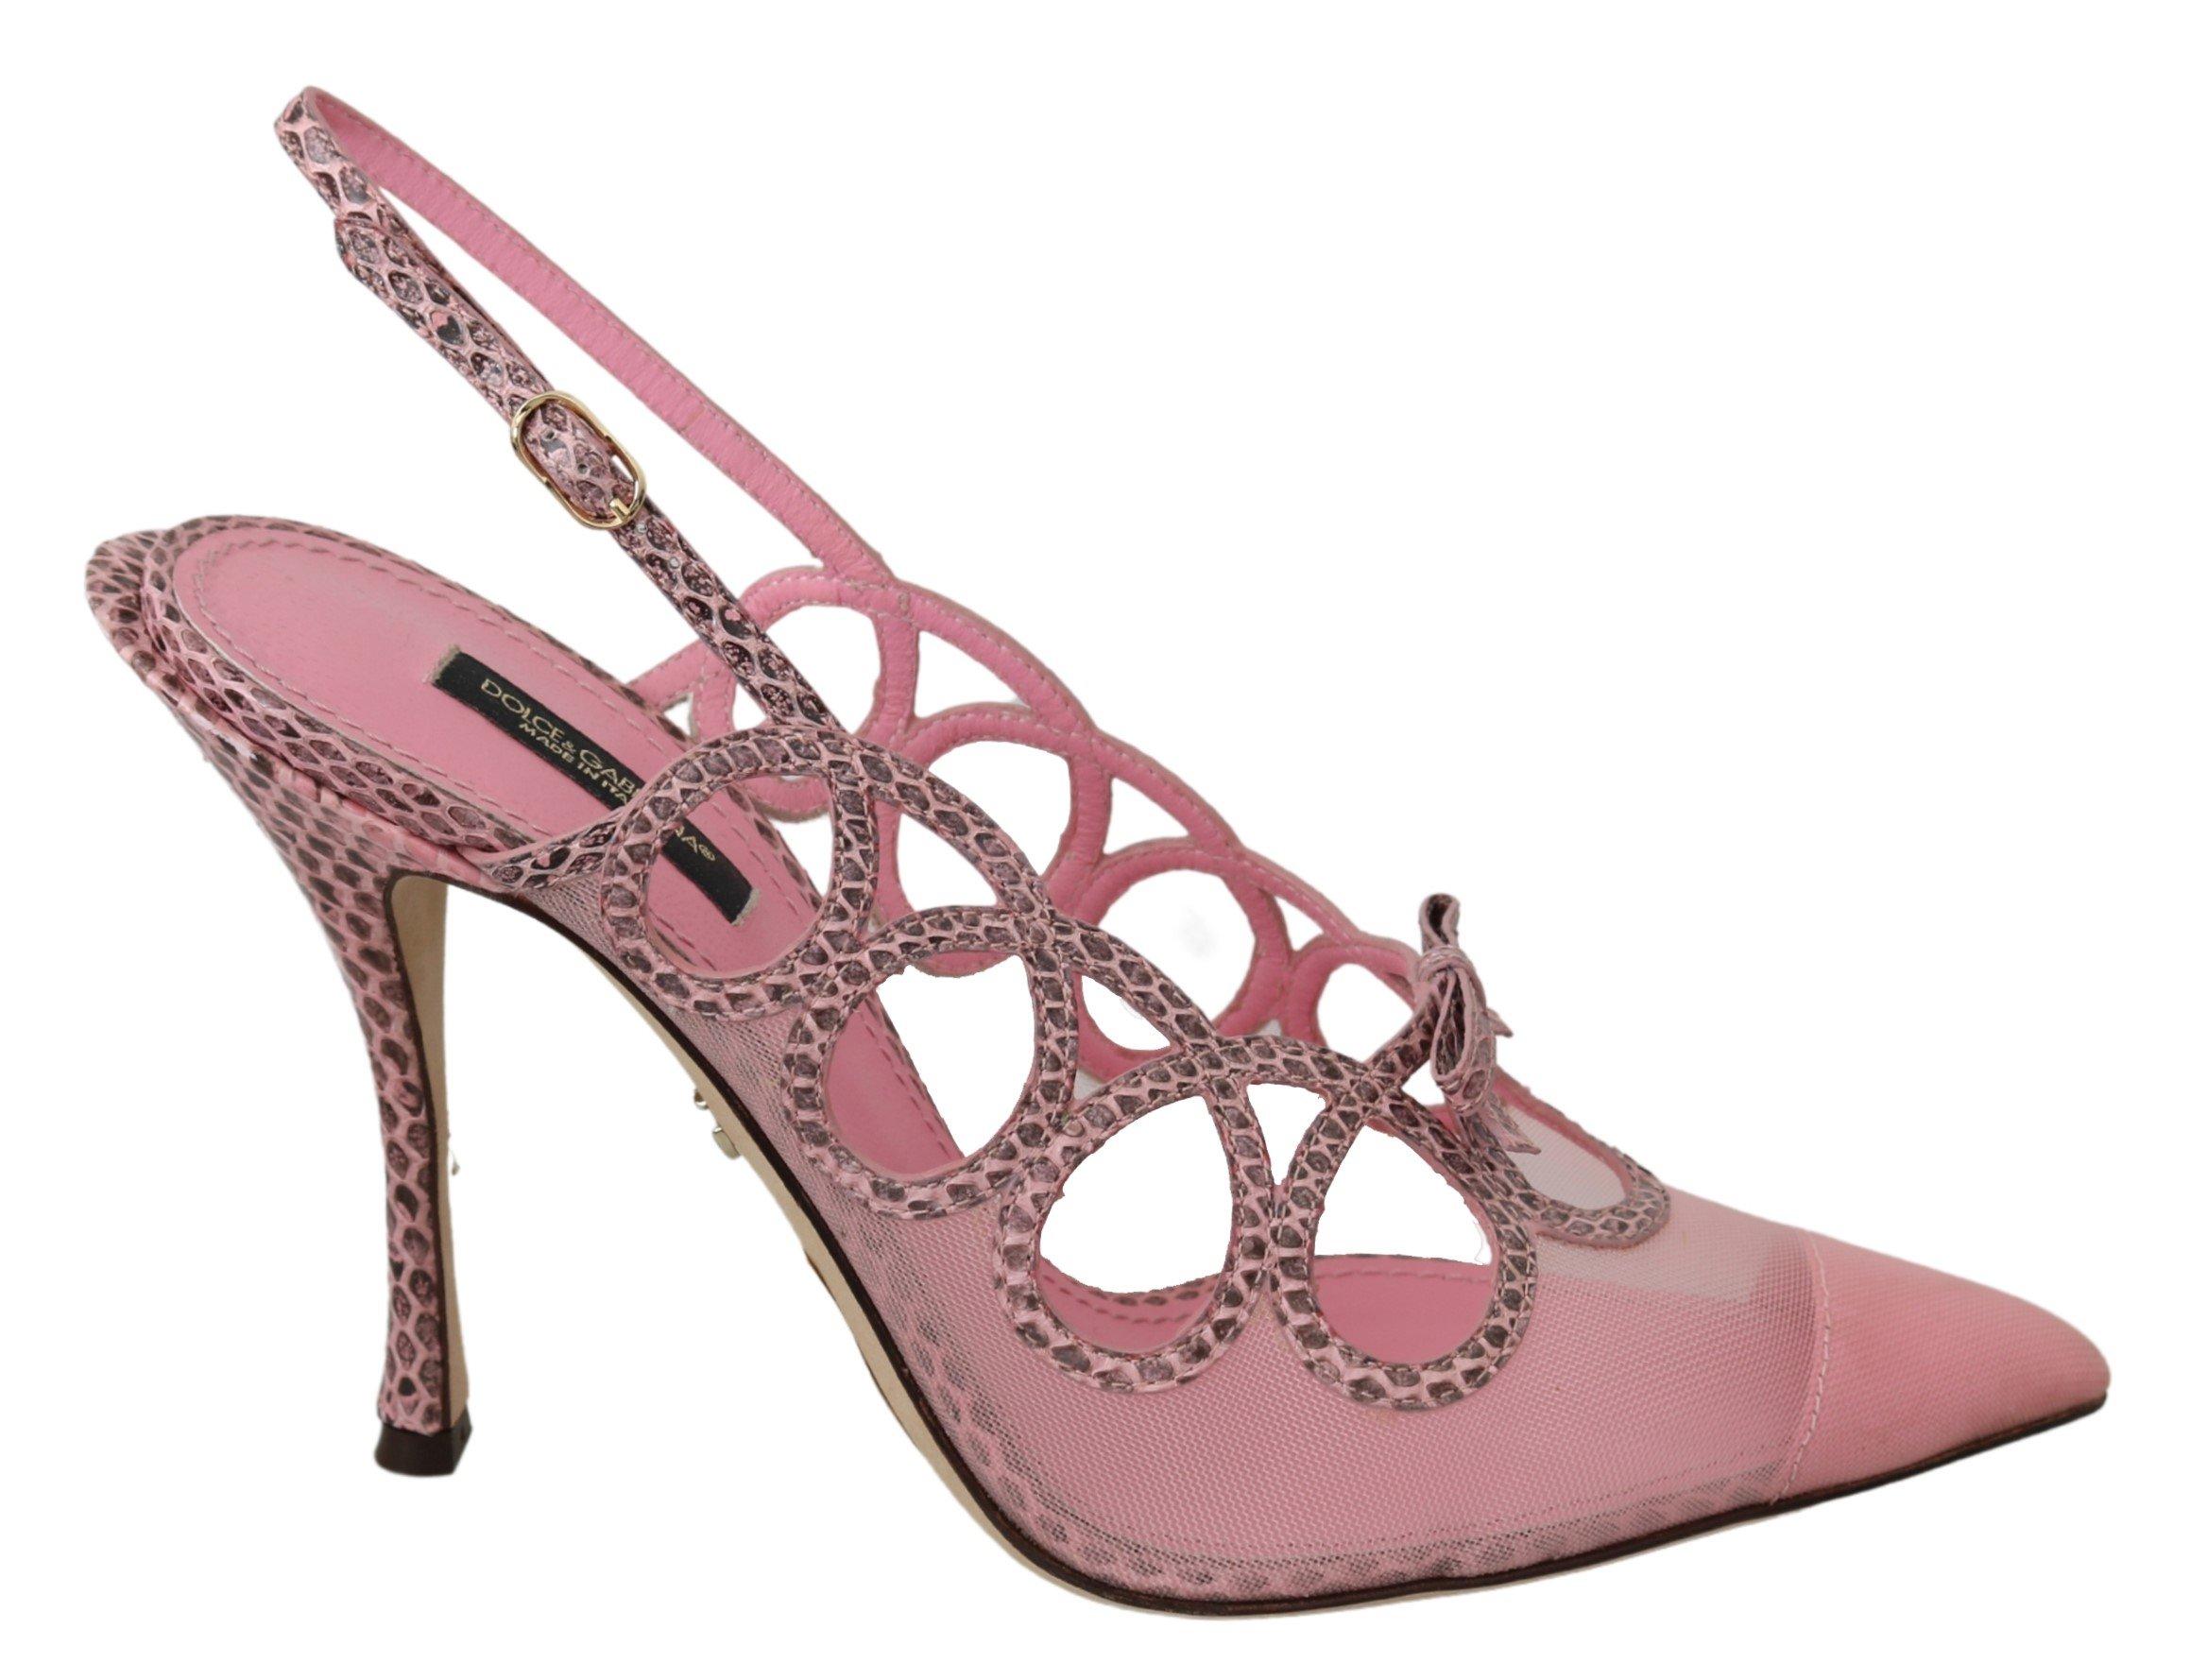 Dolce & Gabbana Women's Slingback Slim Ayers Sandal Pink LA6926 - EU39/US8.5